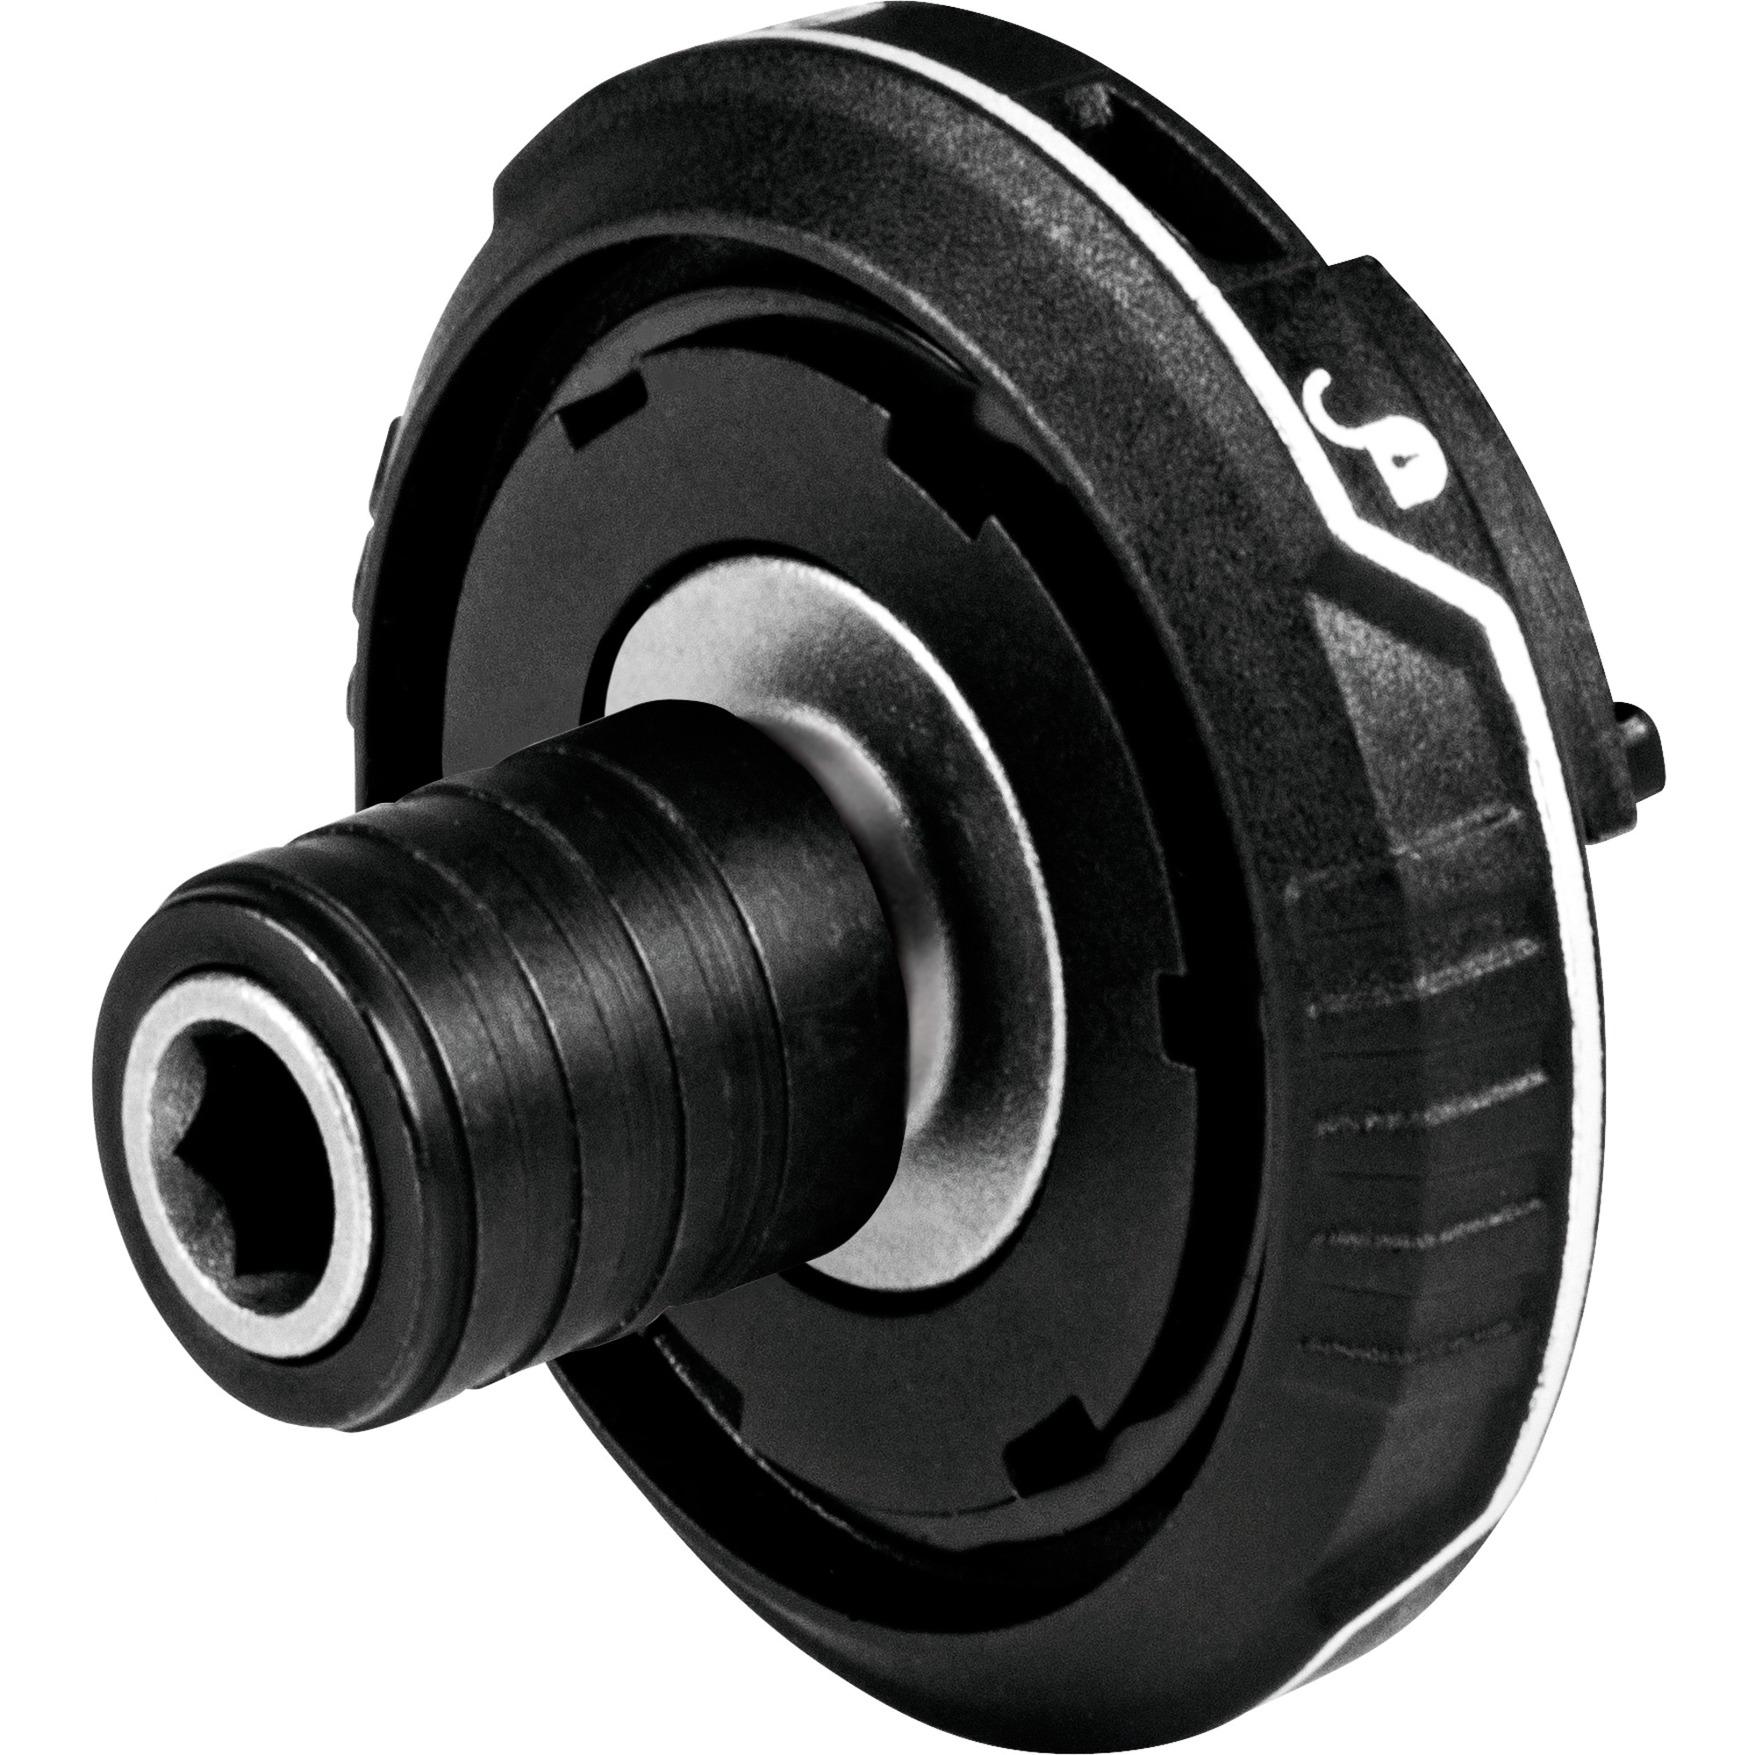 Image of FlexiClick-Bitaufsatz GFA 12-X Professional